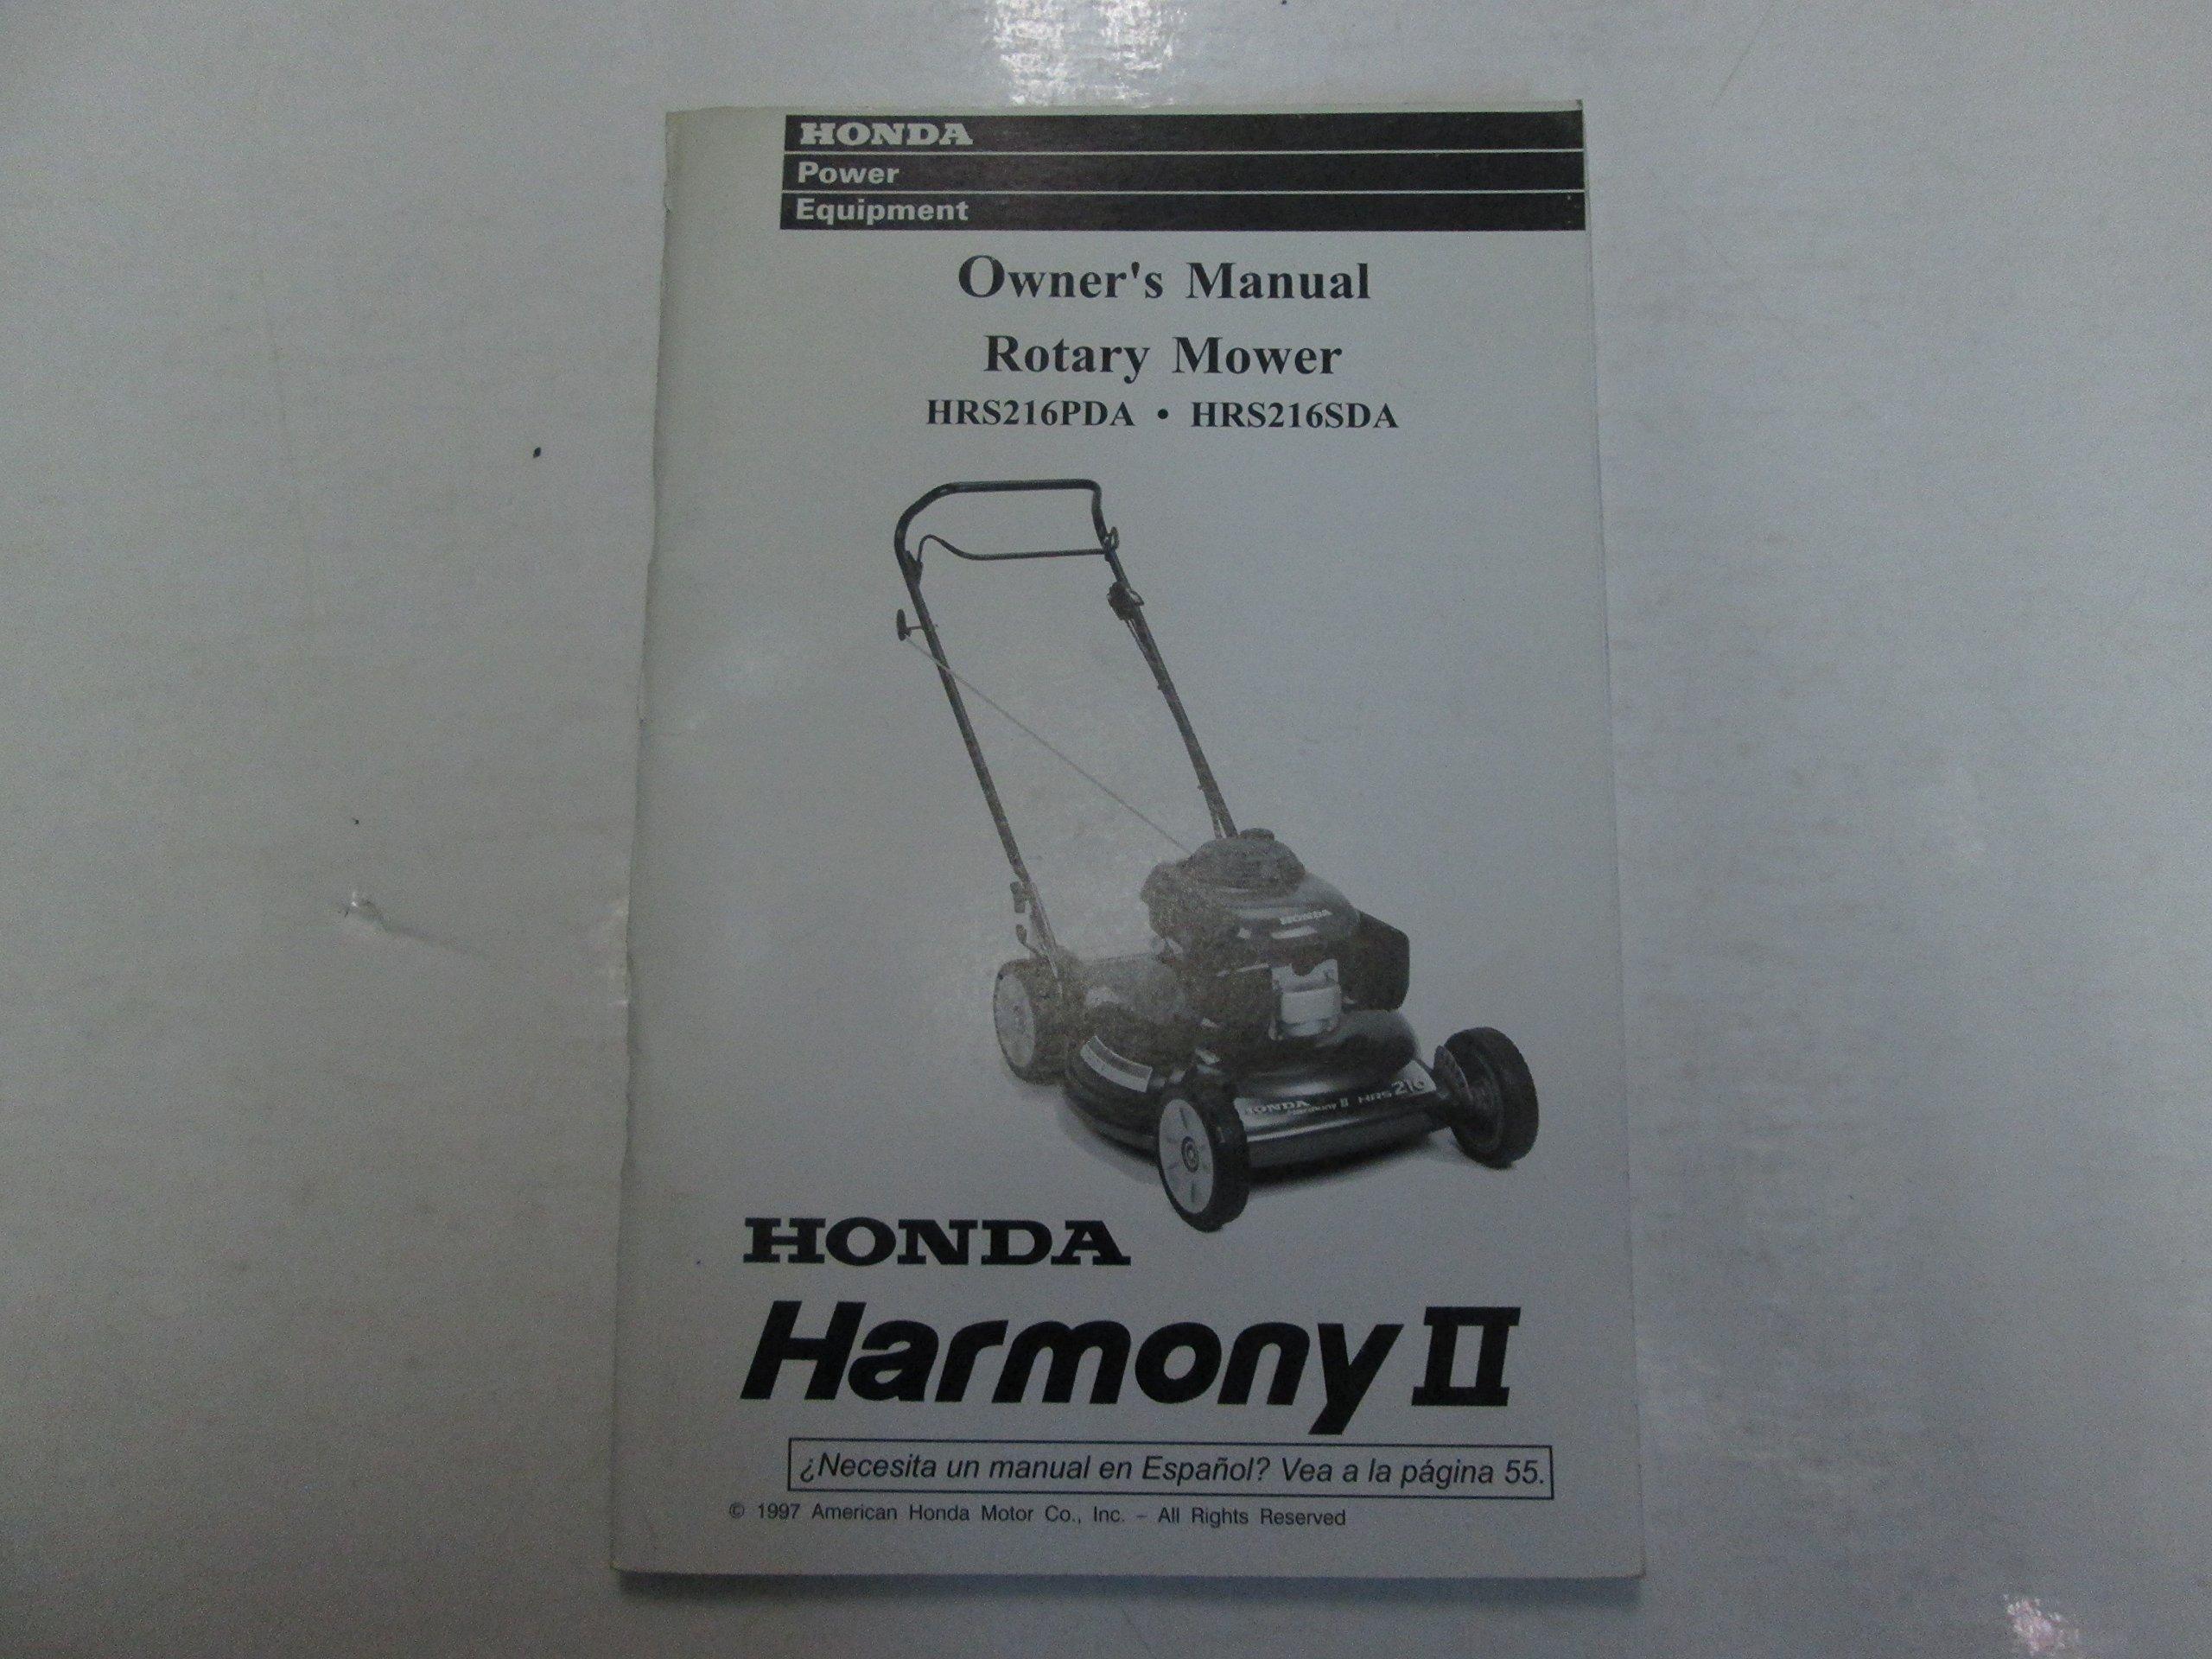 1998 Honda HRS216PDA HRS216SDA Harmony II Rotary Mower Owners Manual STAINS  WORN: Honda Motor Co.: Amazon.com: Books